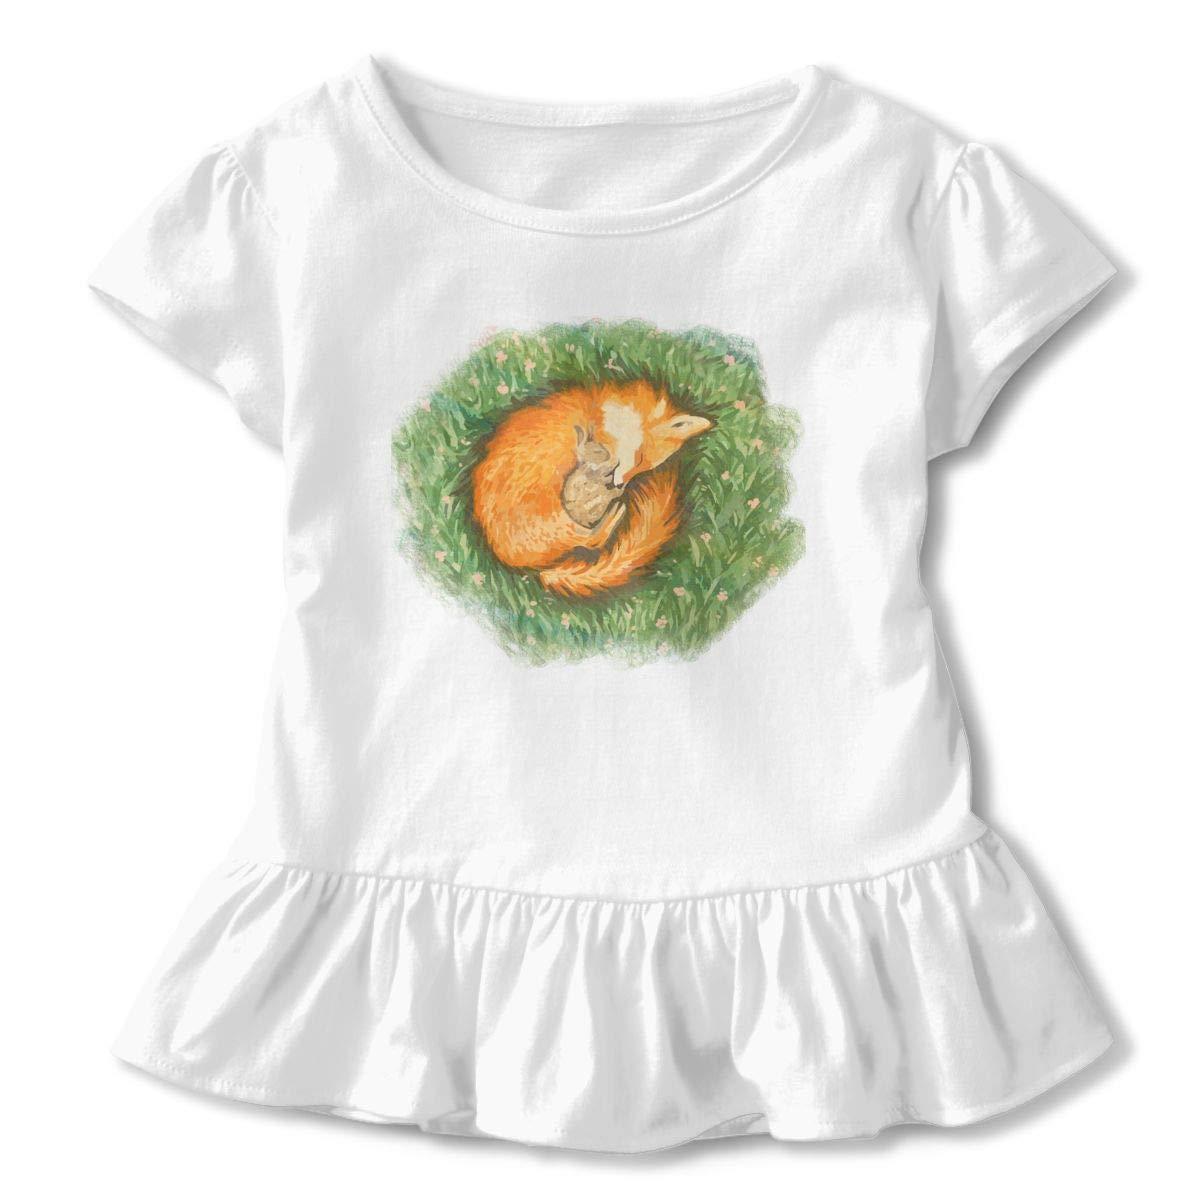 Fox and Rabbit Print Toddler Girls T Shirt Kids Cotton Short Sleeve Ruffle Tee